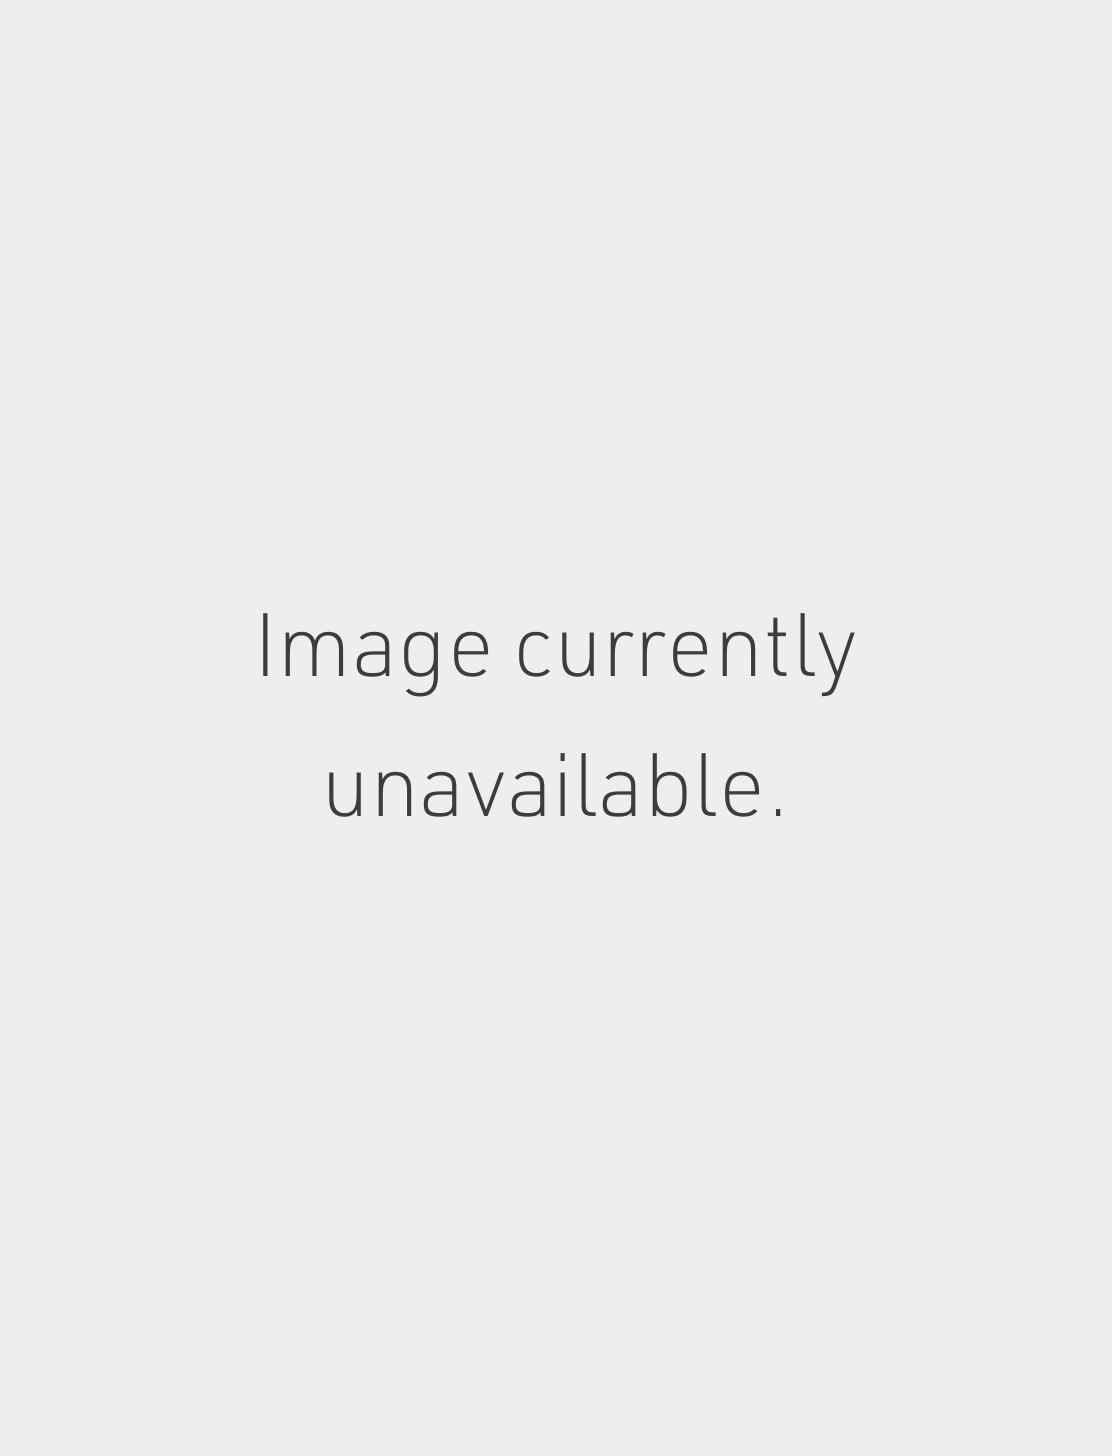 3mm Opal Thin Braid Threaded Stud (Helix) Image #1